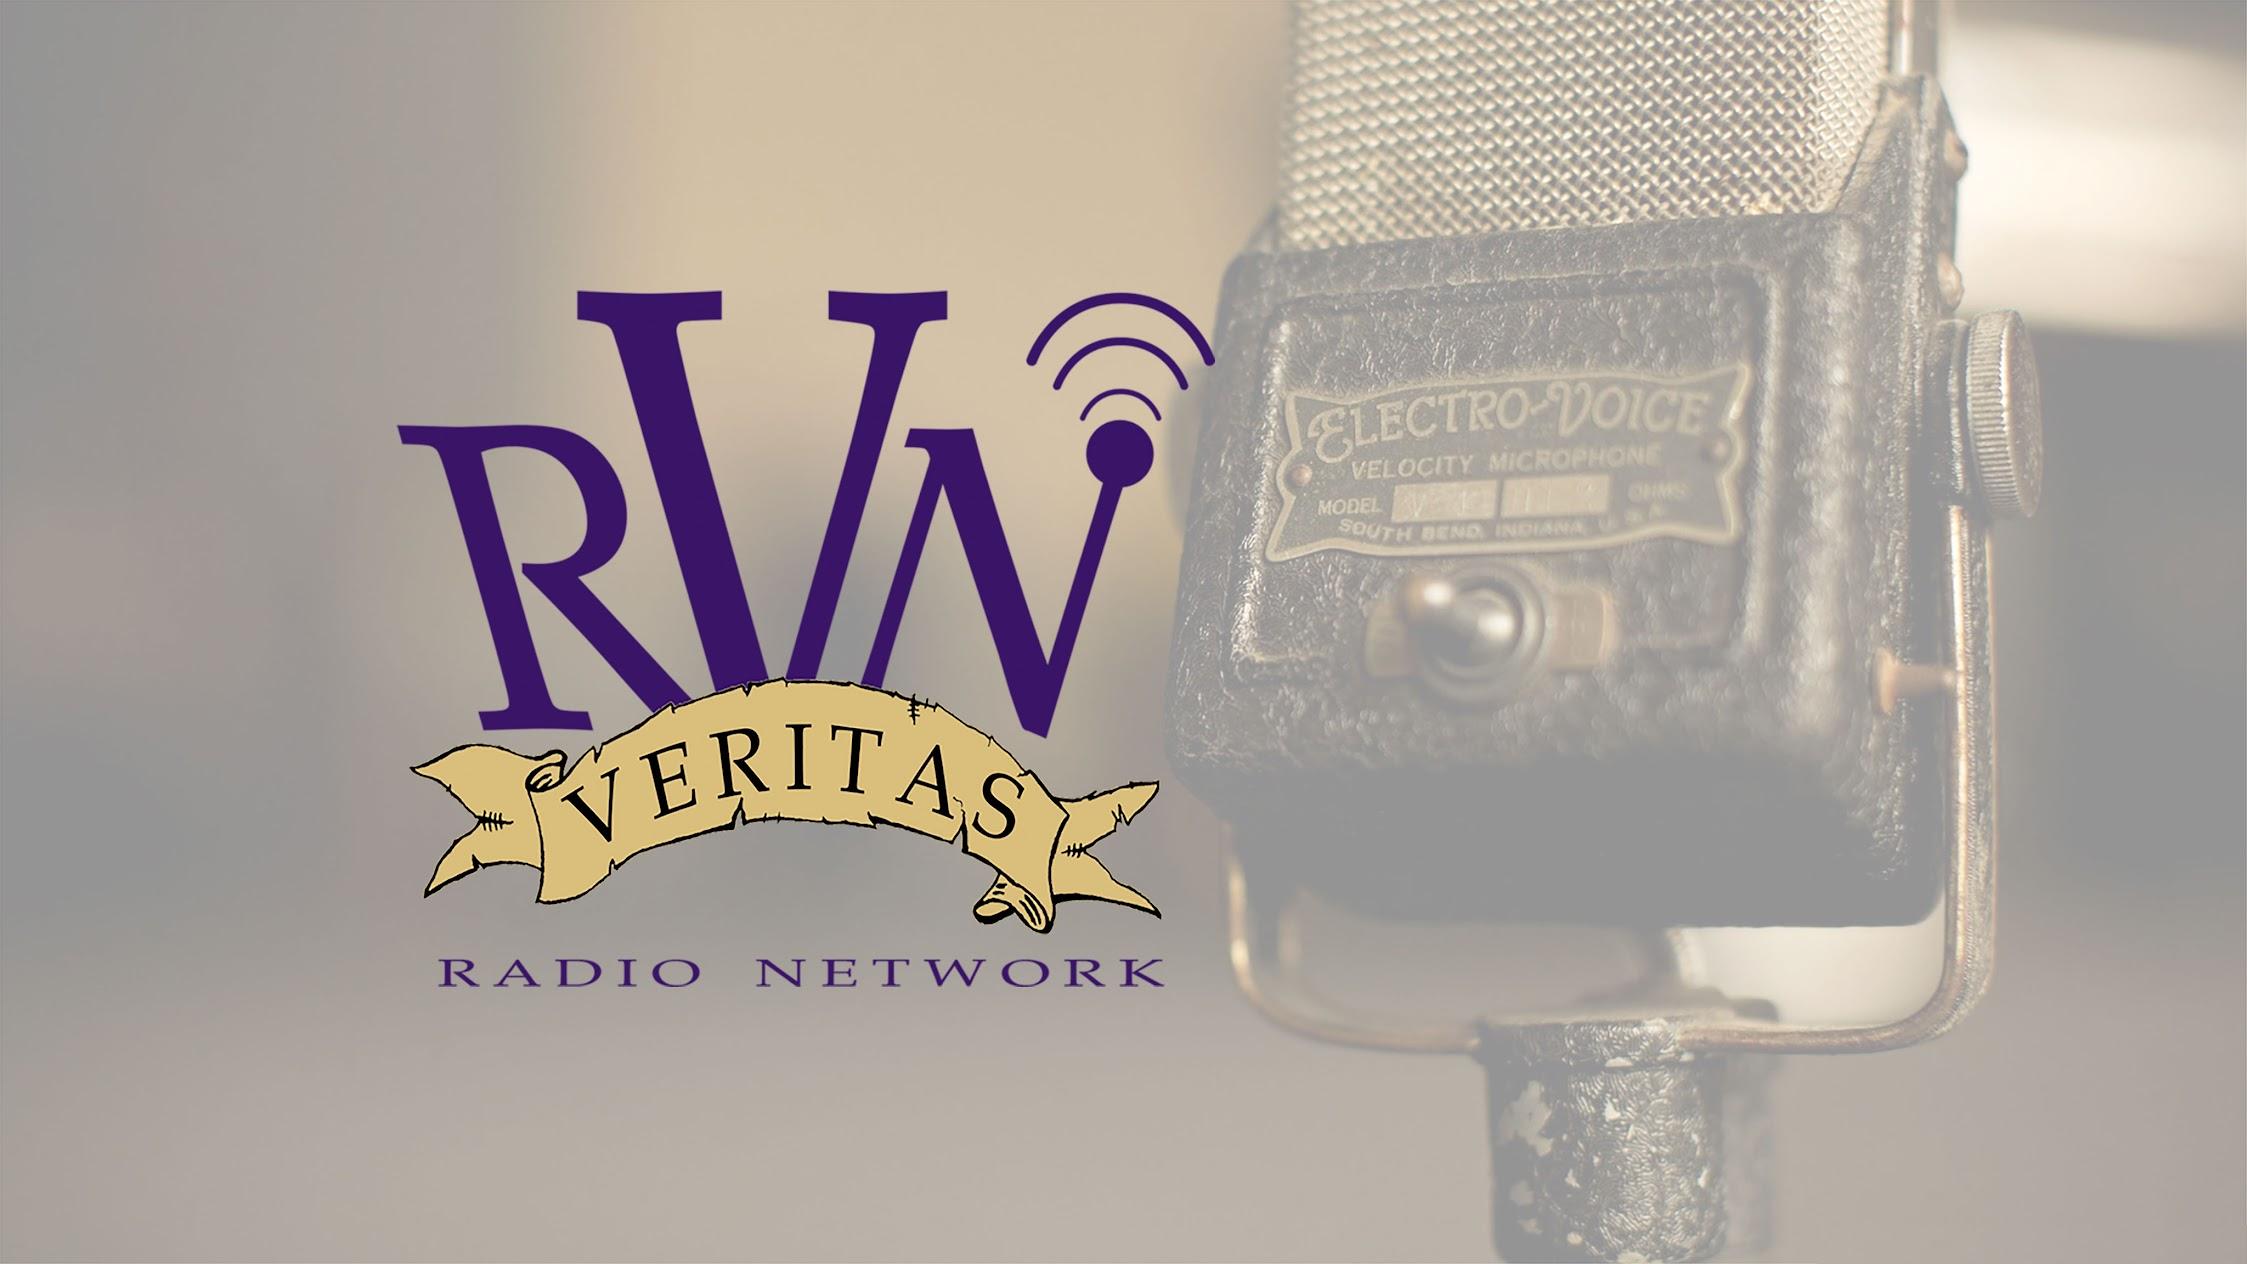 Mike Church Veritas Radio Network